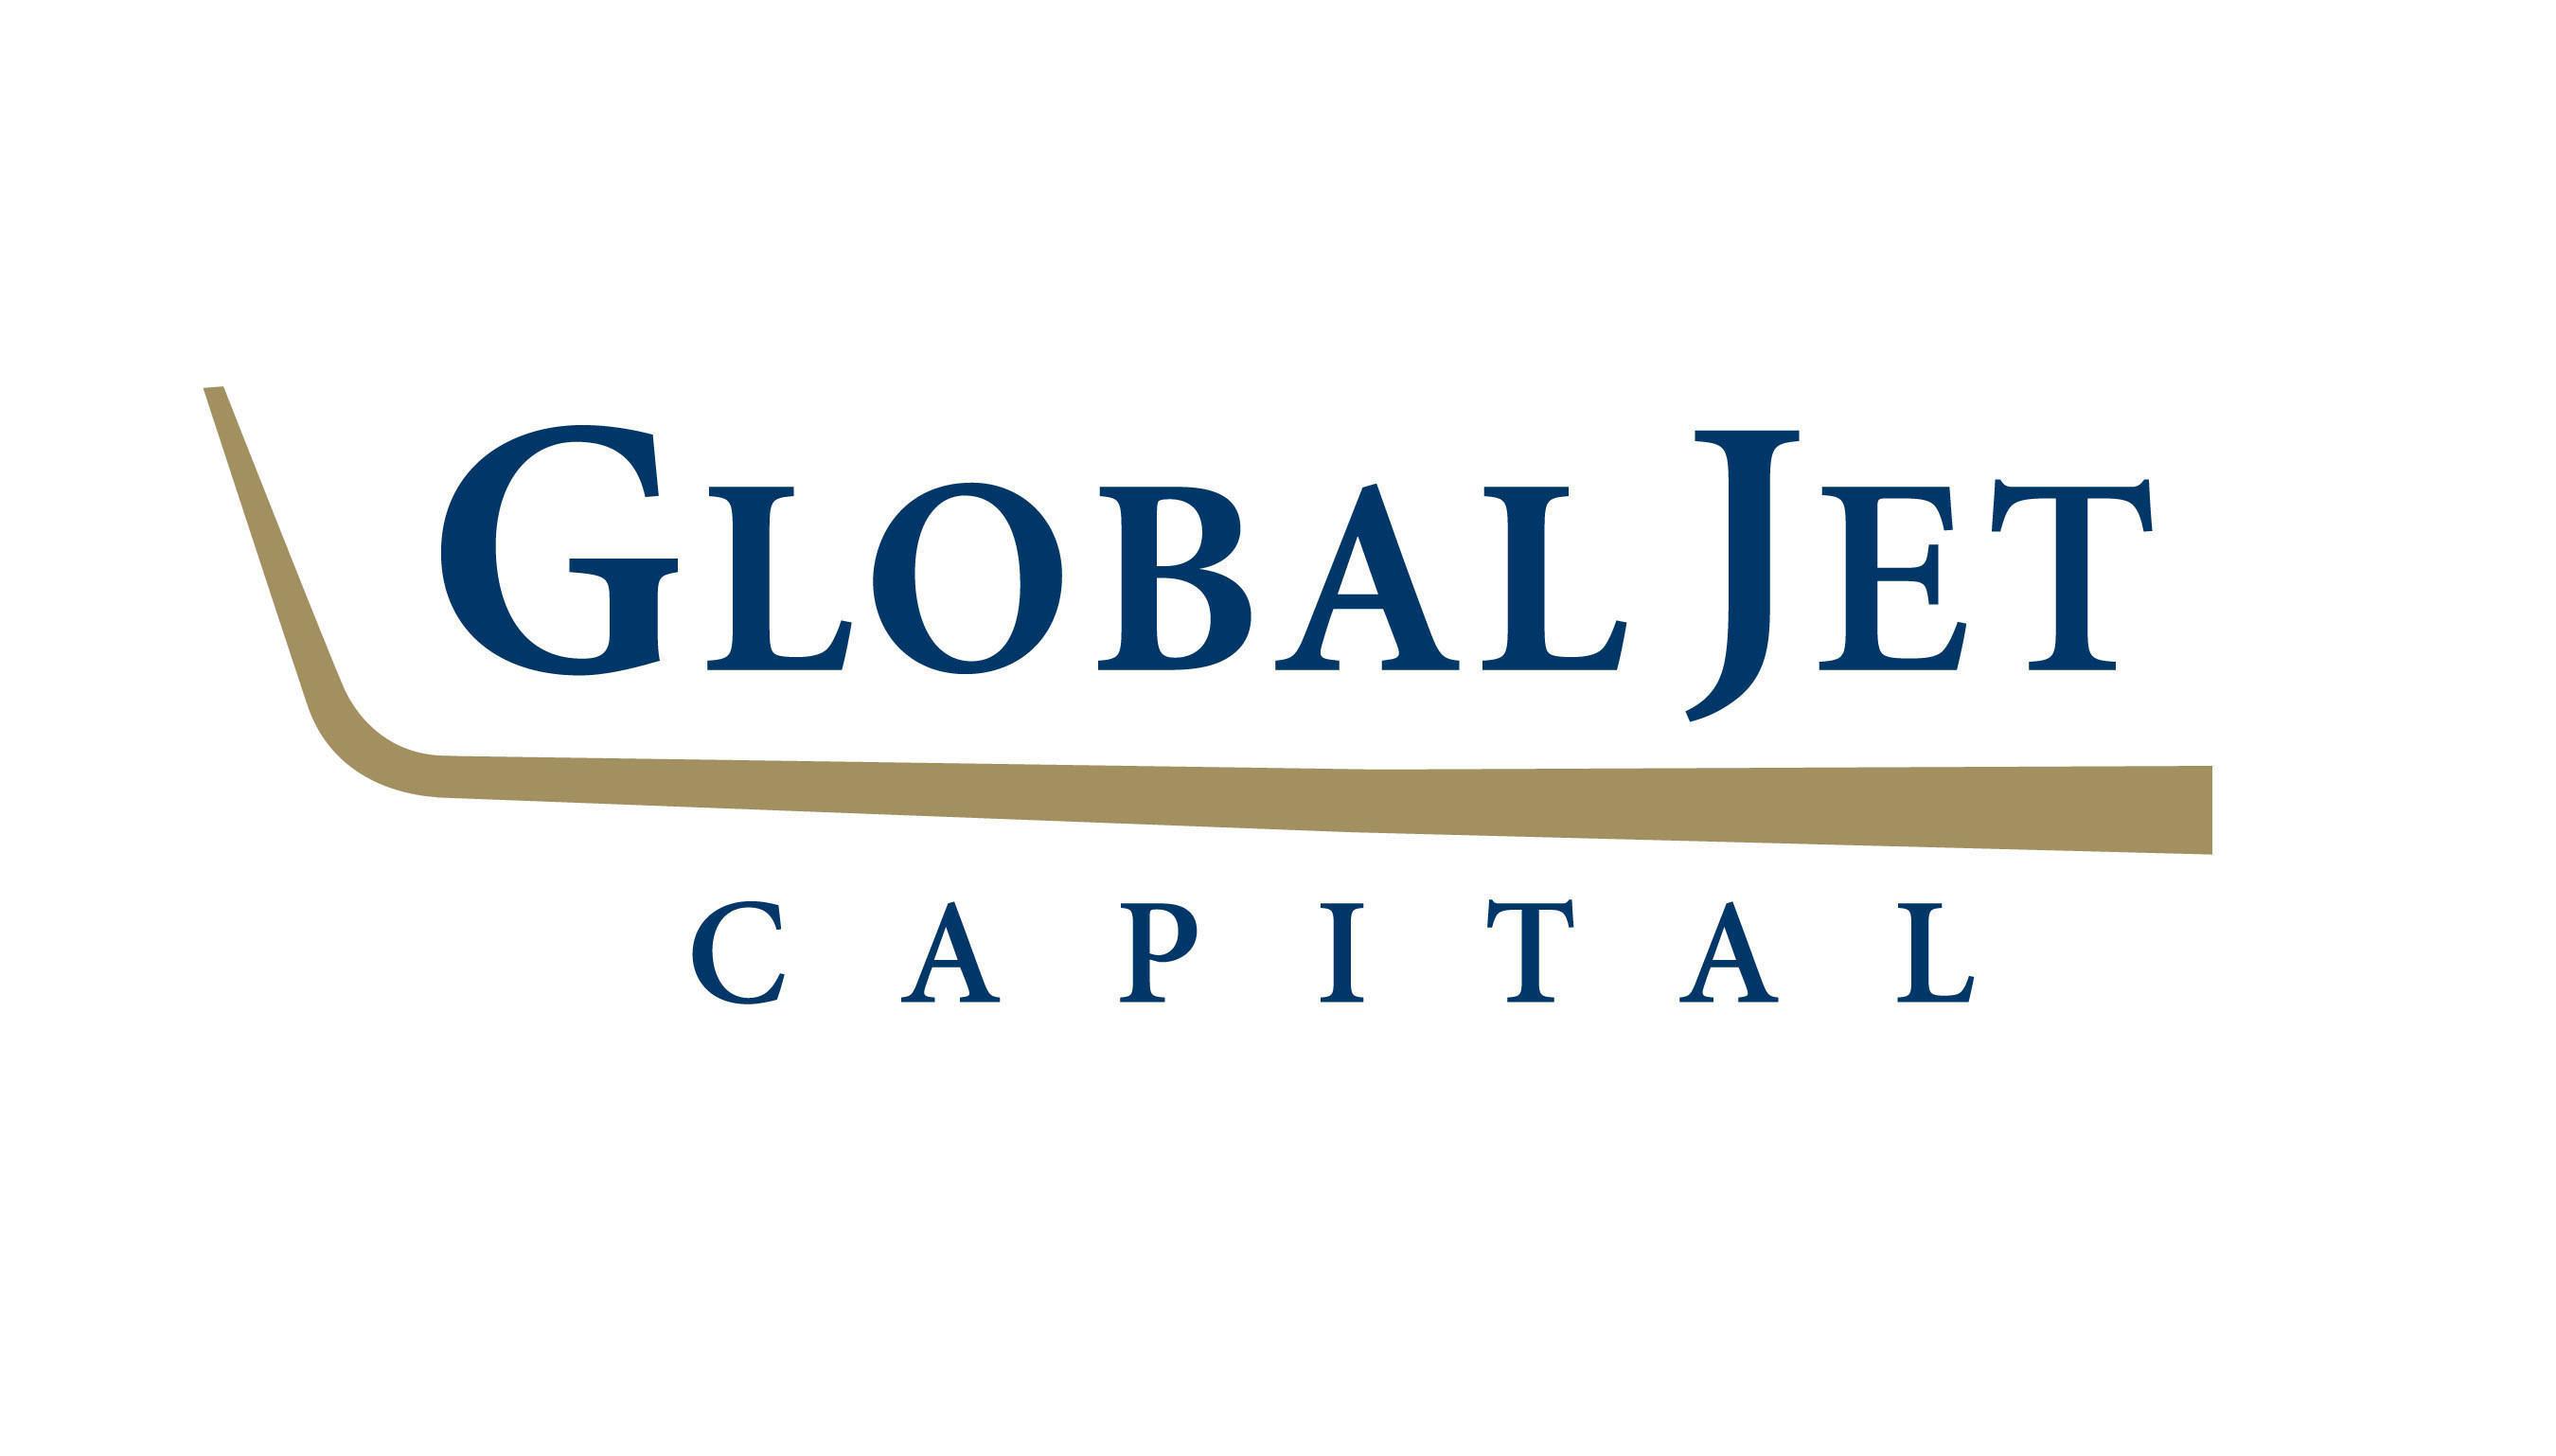 globalization capital